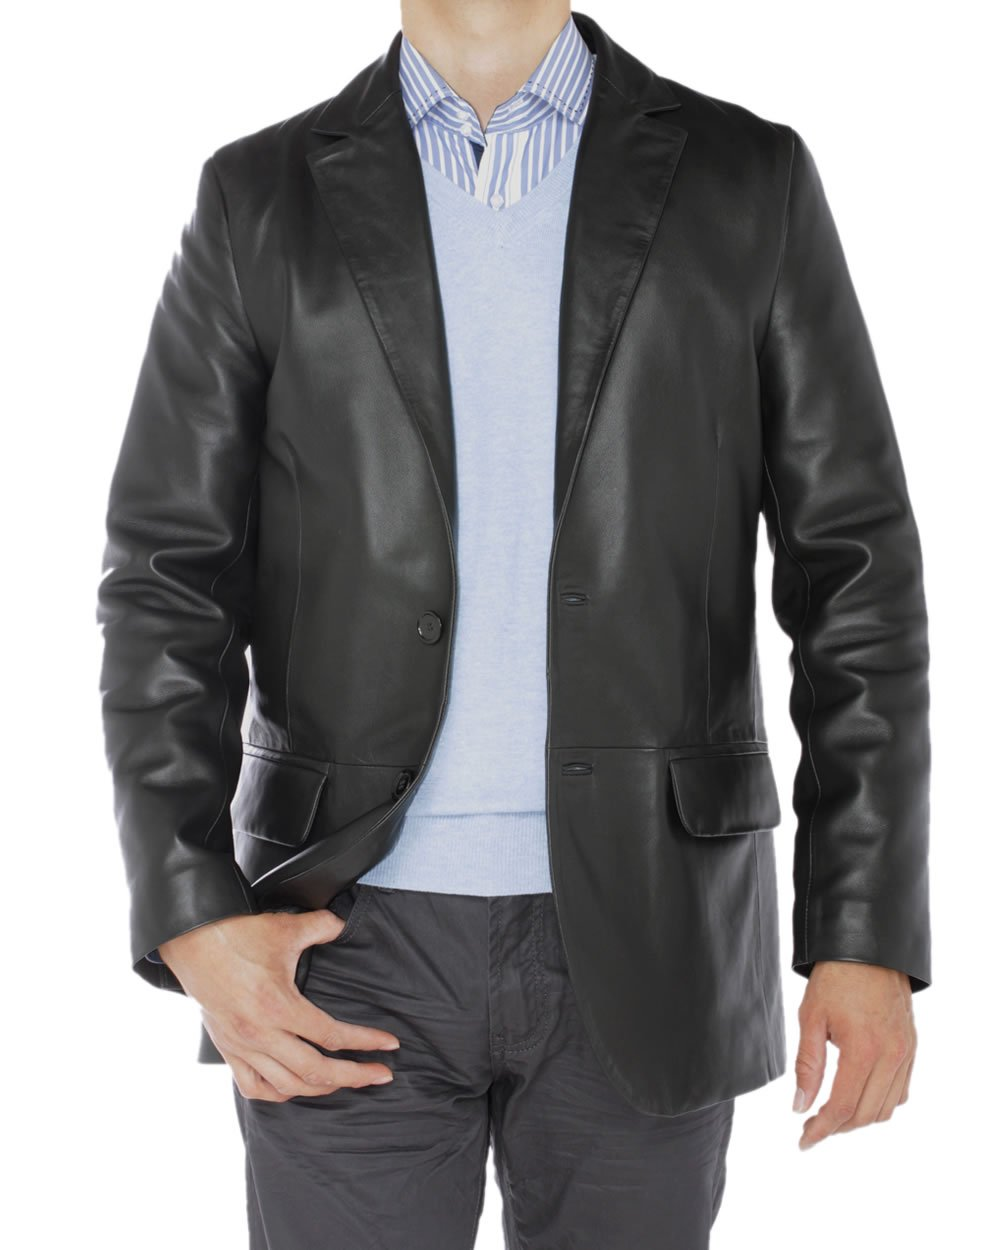 Luciano Natazzi Men's Lambskin Leather Blazer Two Button Modern Fit Jacket (3X-Large / US 51-52, Black)